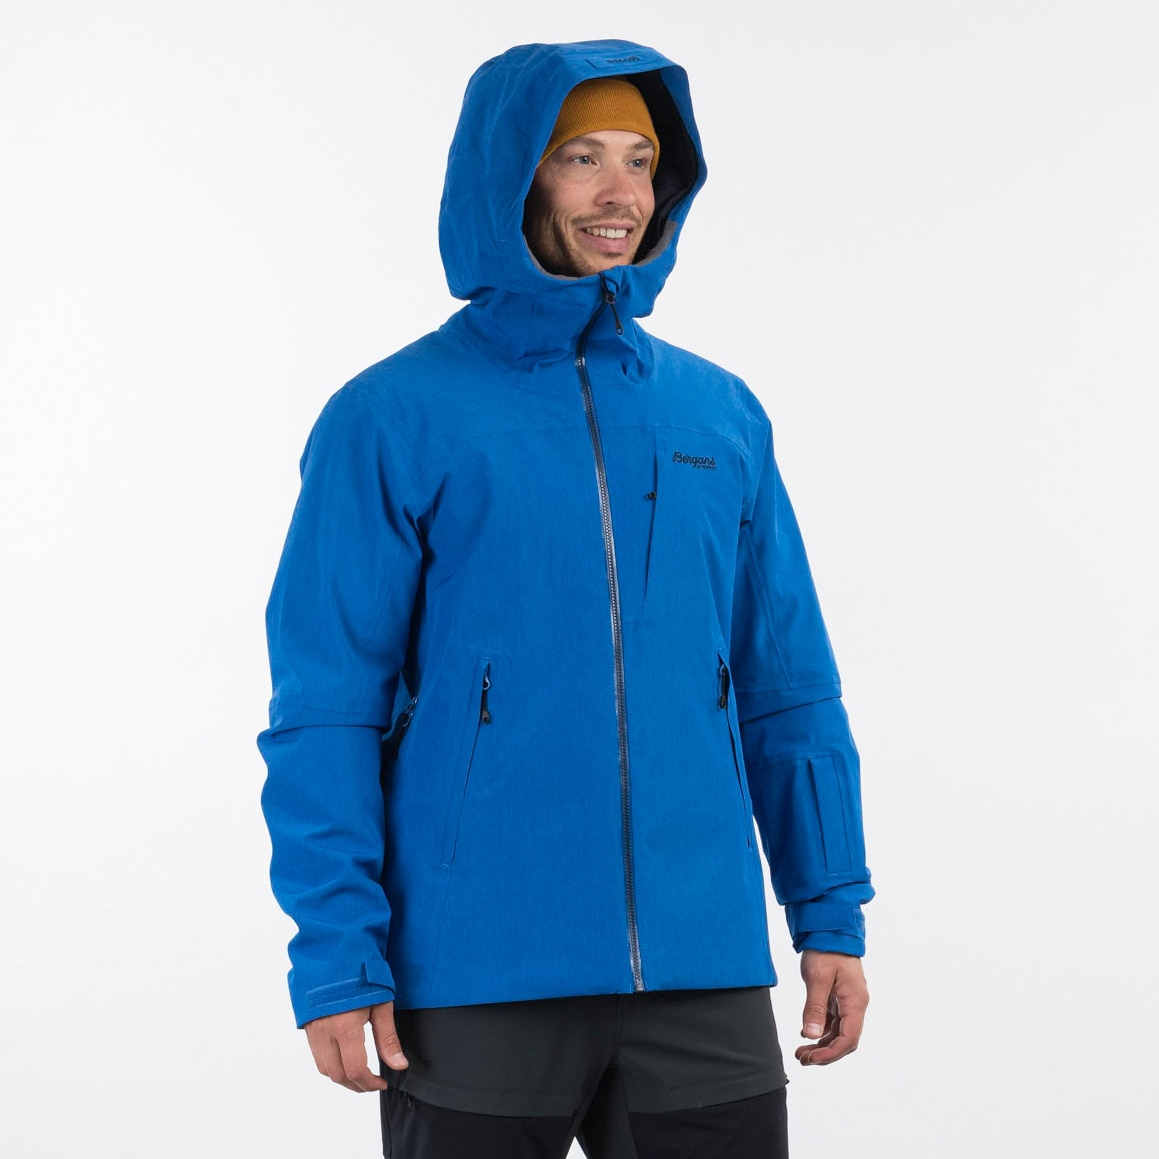 Hafjell Insulated Jacket